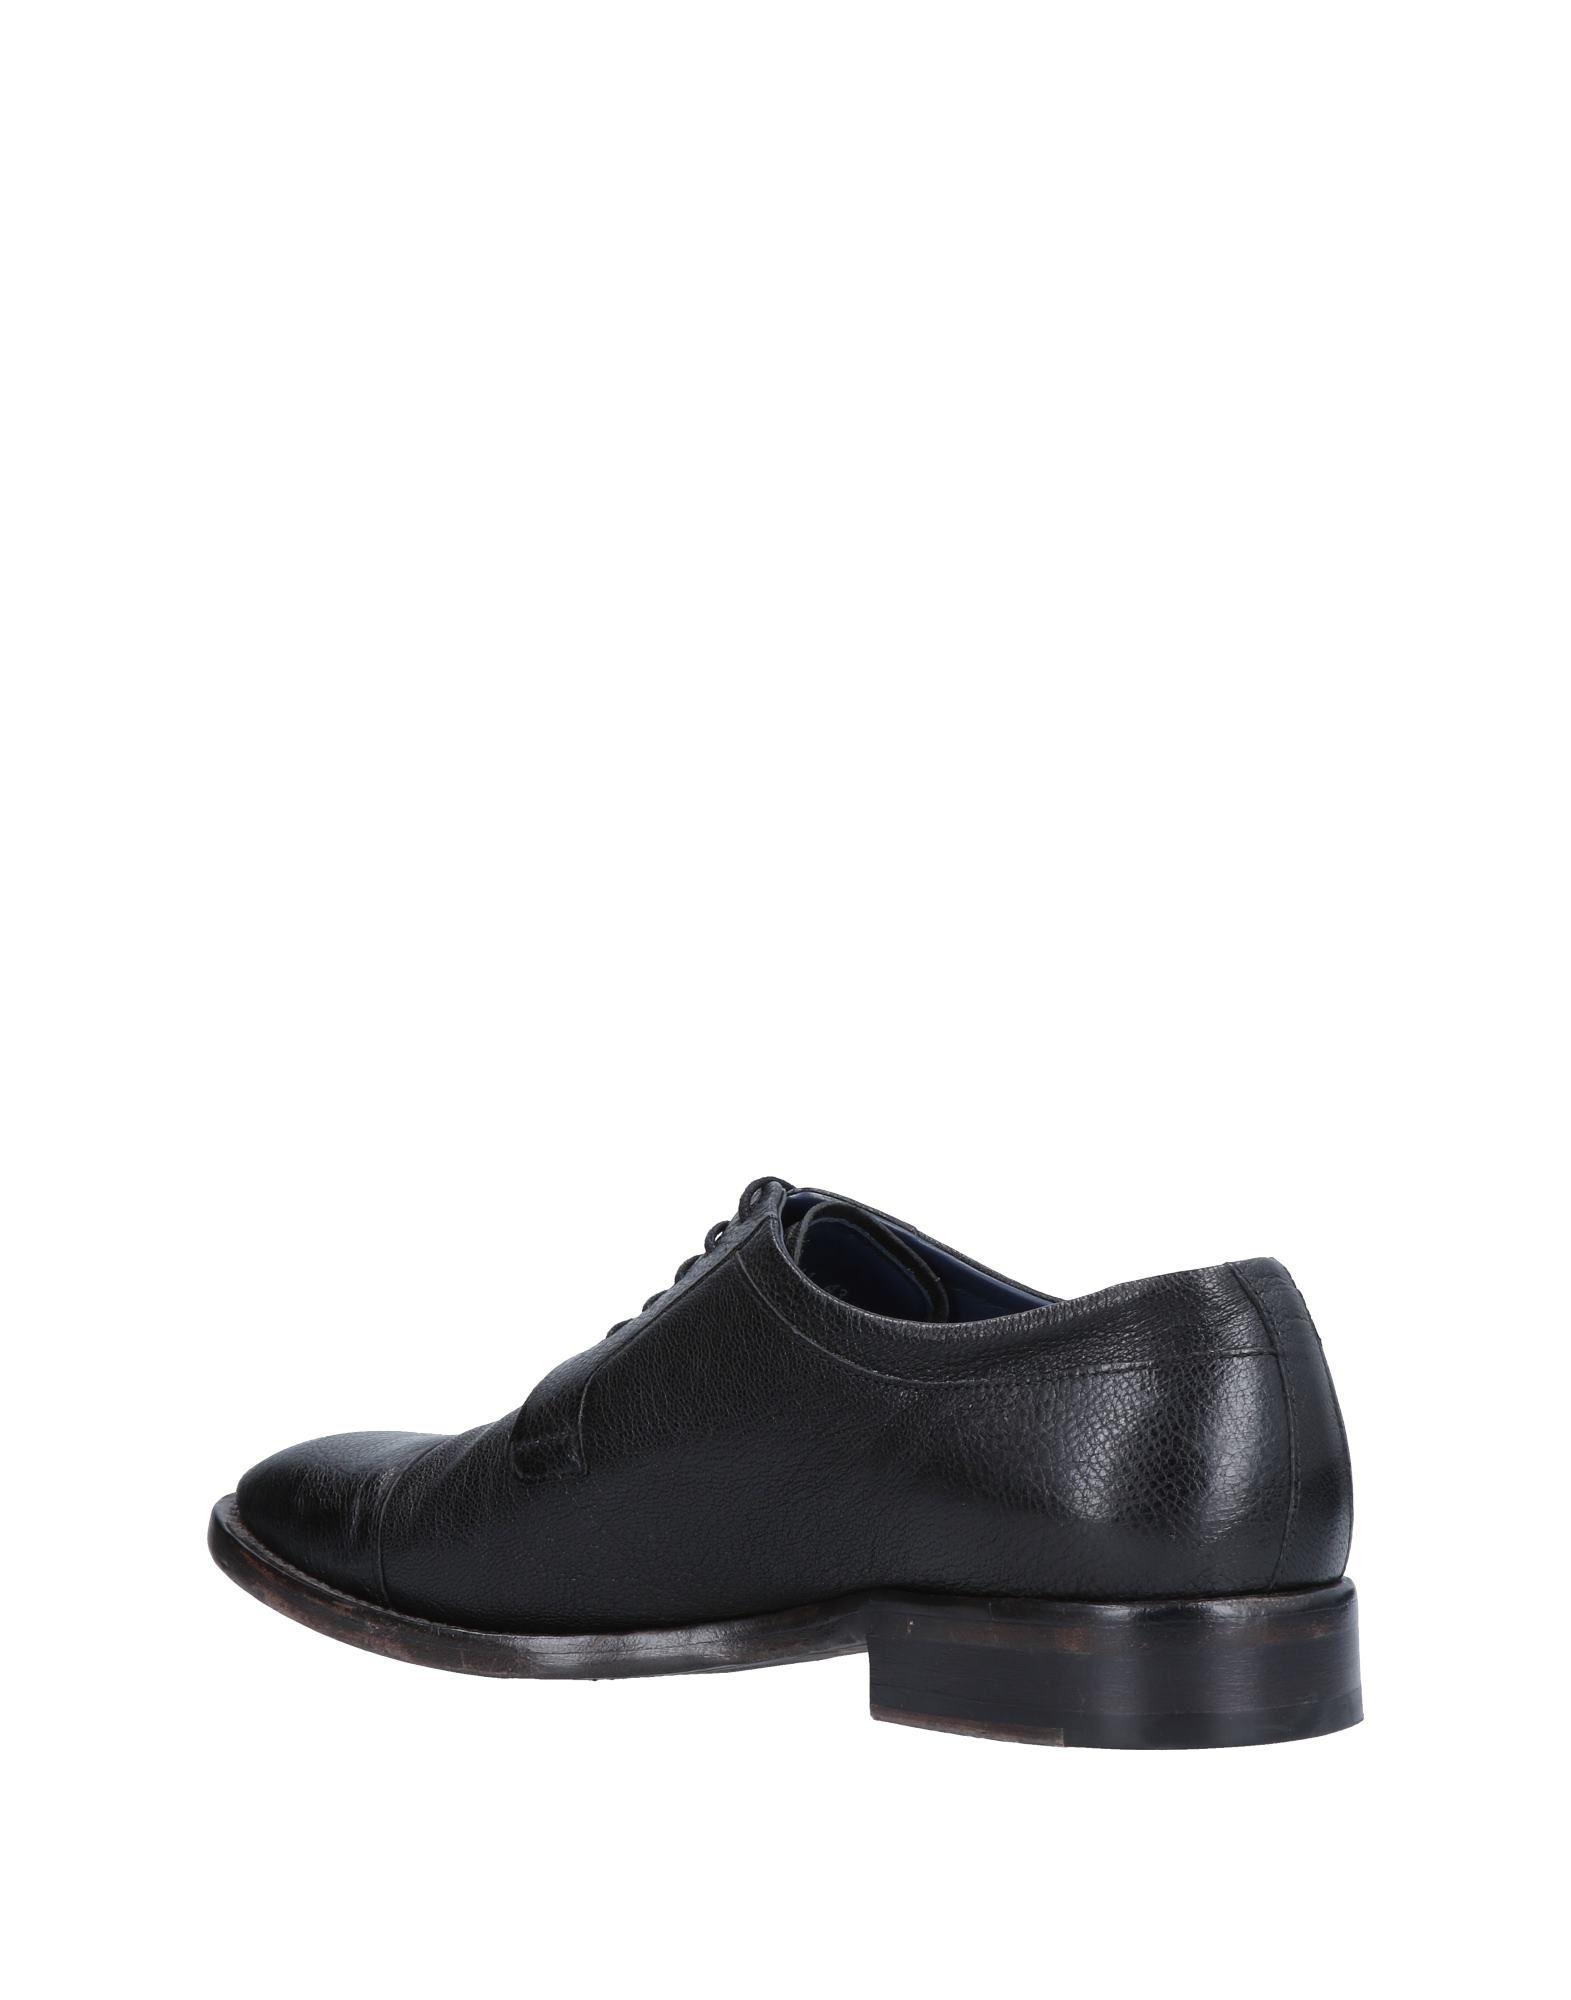 Rabatt echte Schuhe Creation Of Minds Schnürschuhe Herren  11513029UR